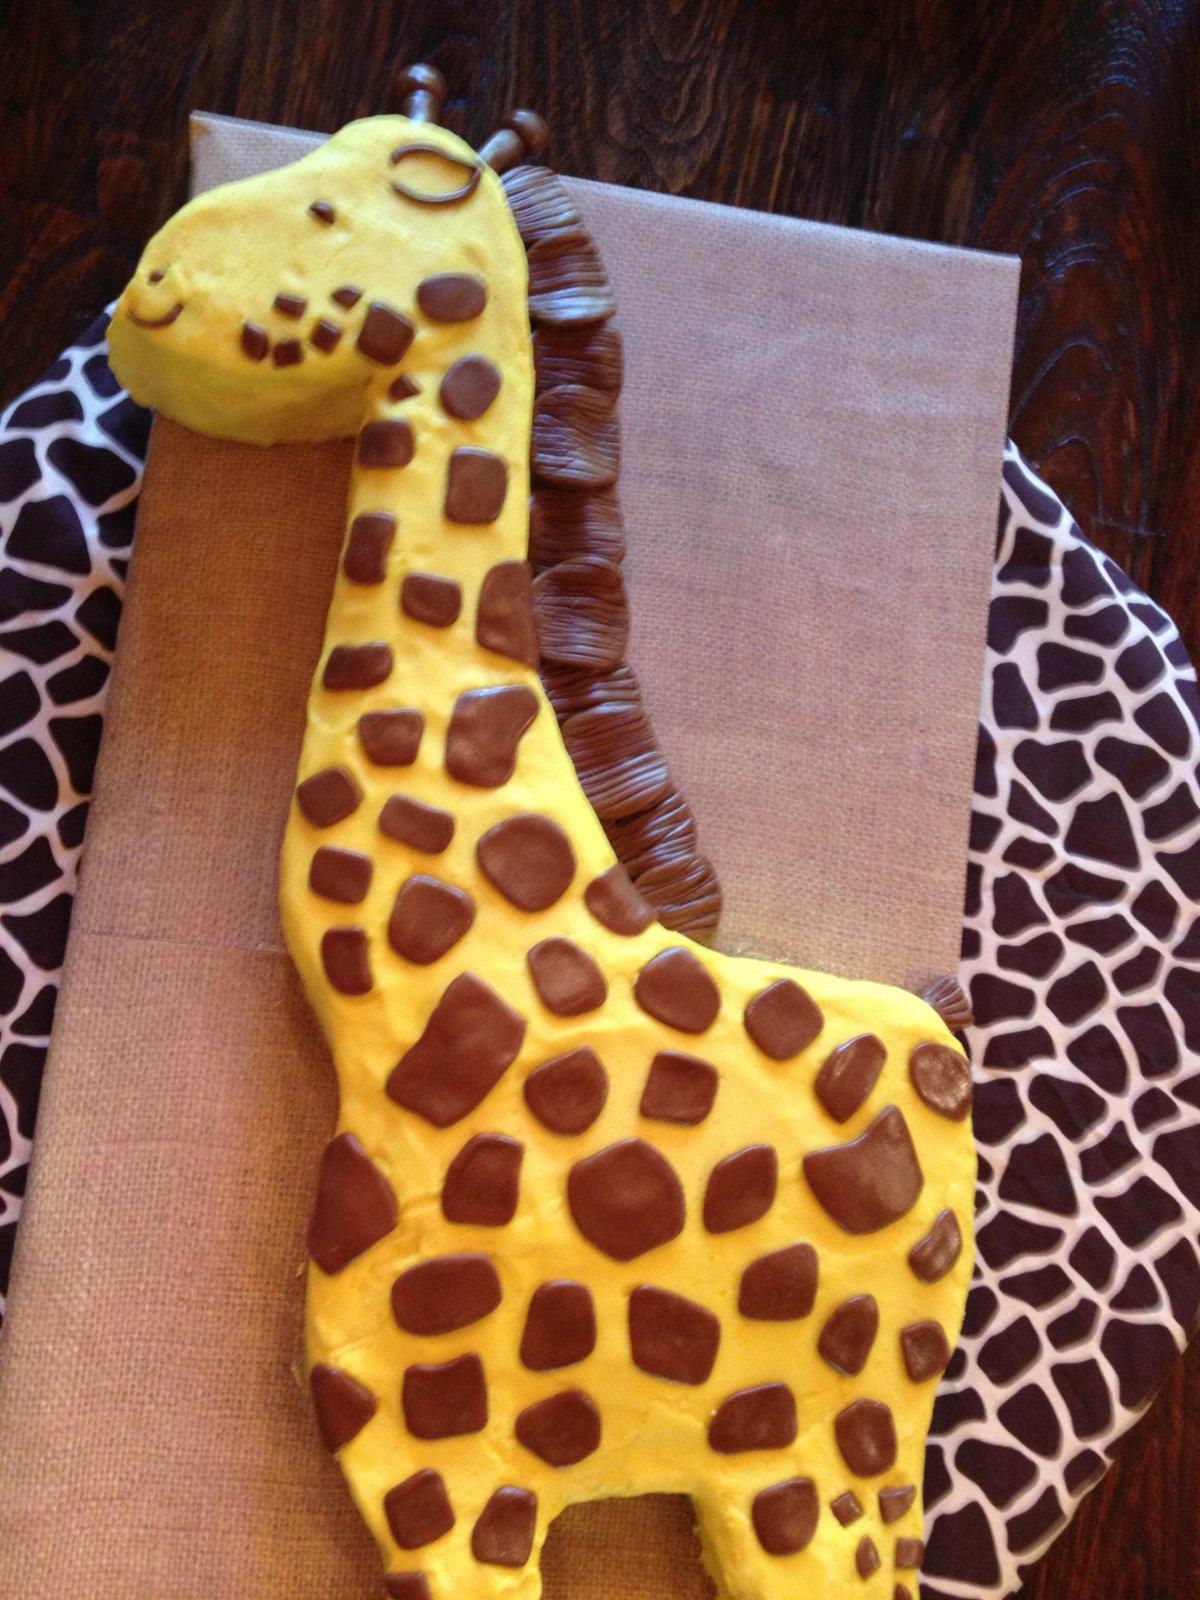 Cake Designs Giraffe : Giraffe Cake Cake Ideas and Designs